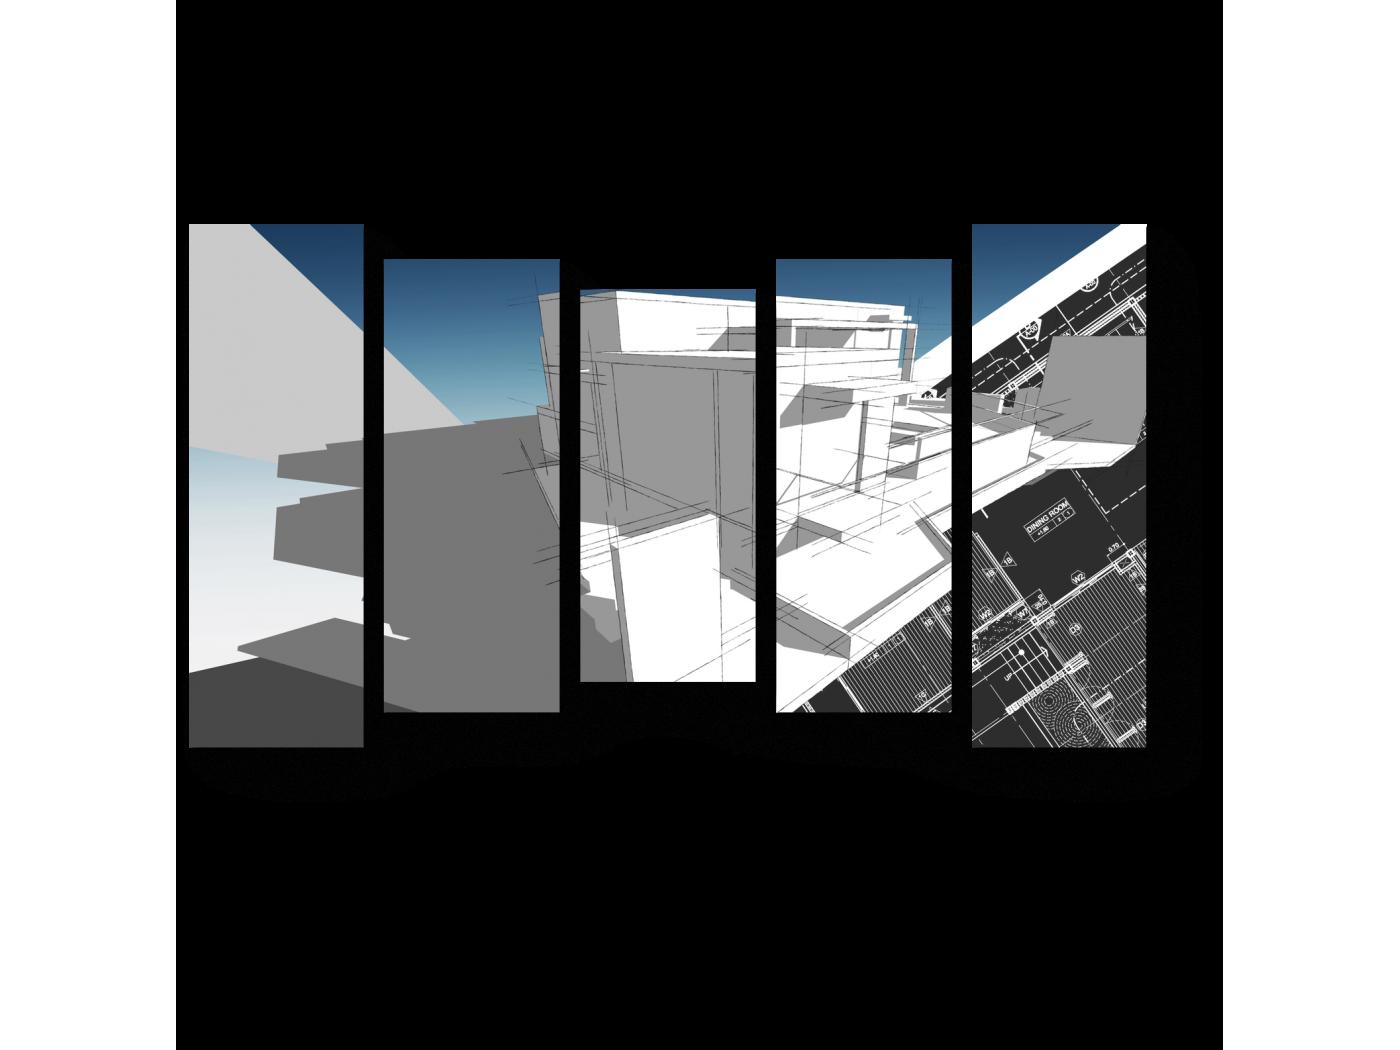 Модульная картина Архитектурный скетч (90x54) фото